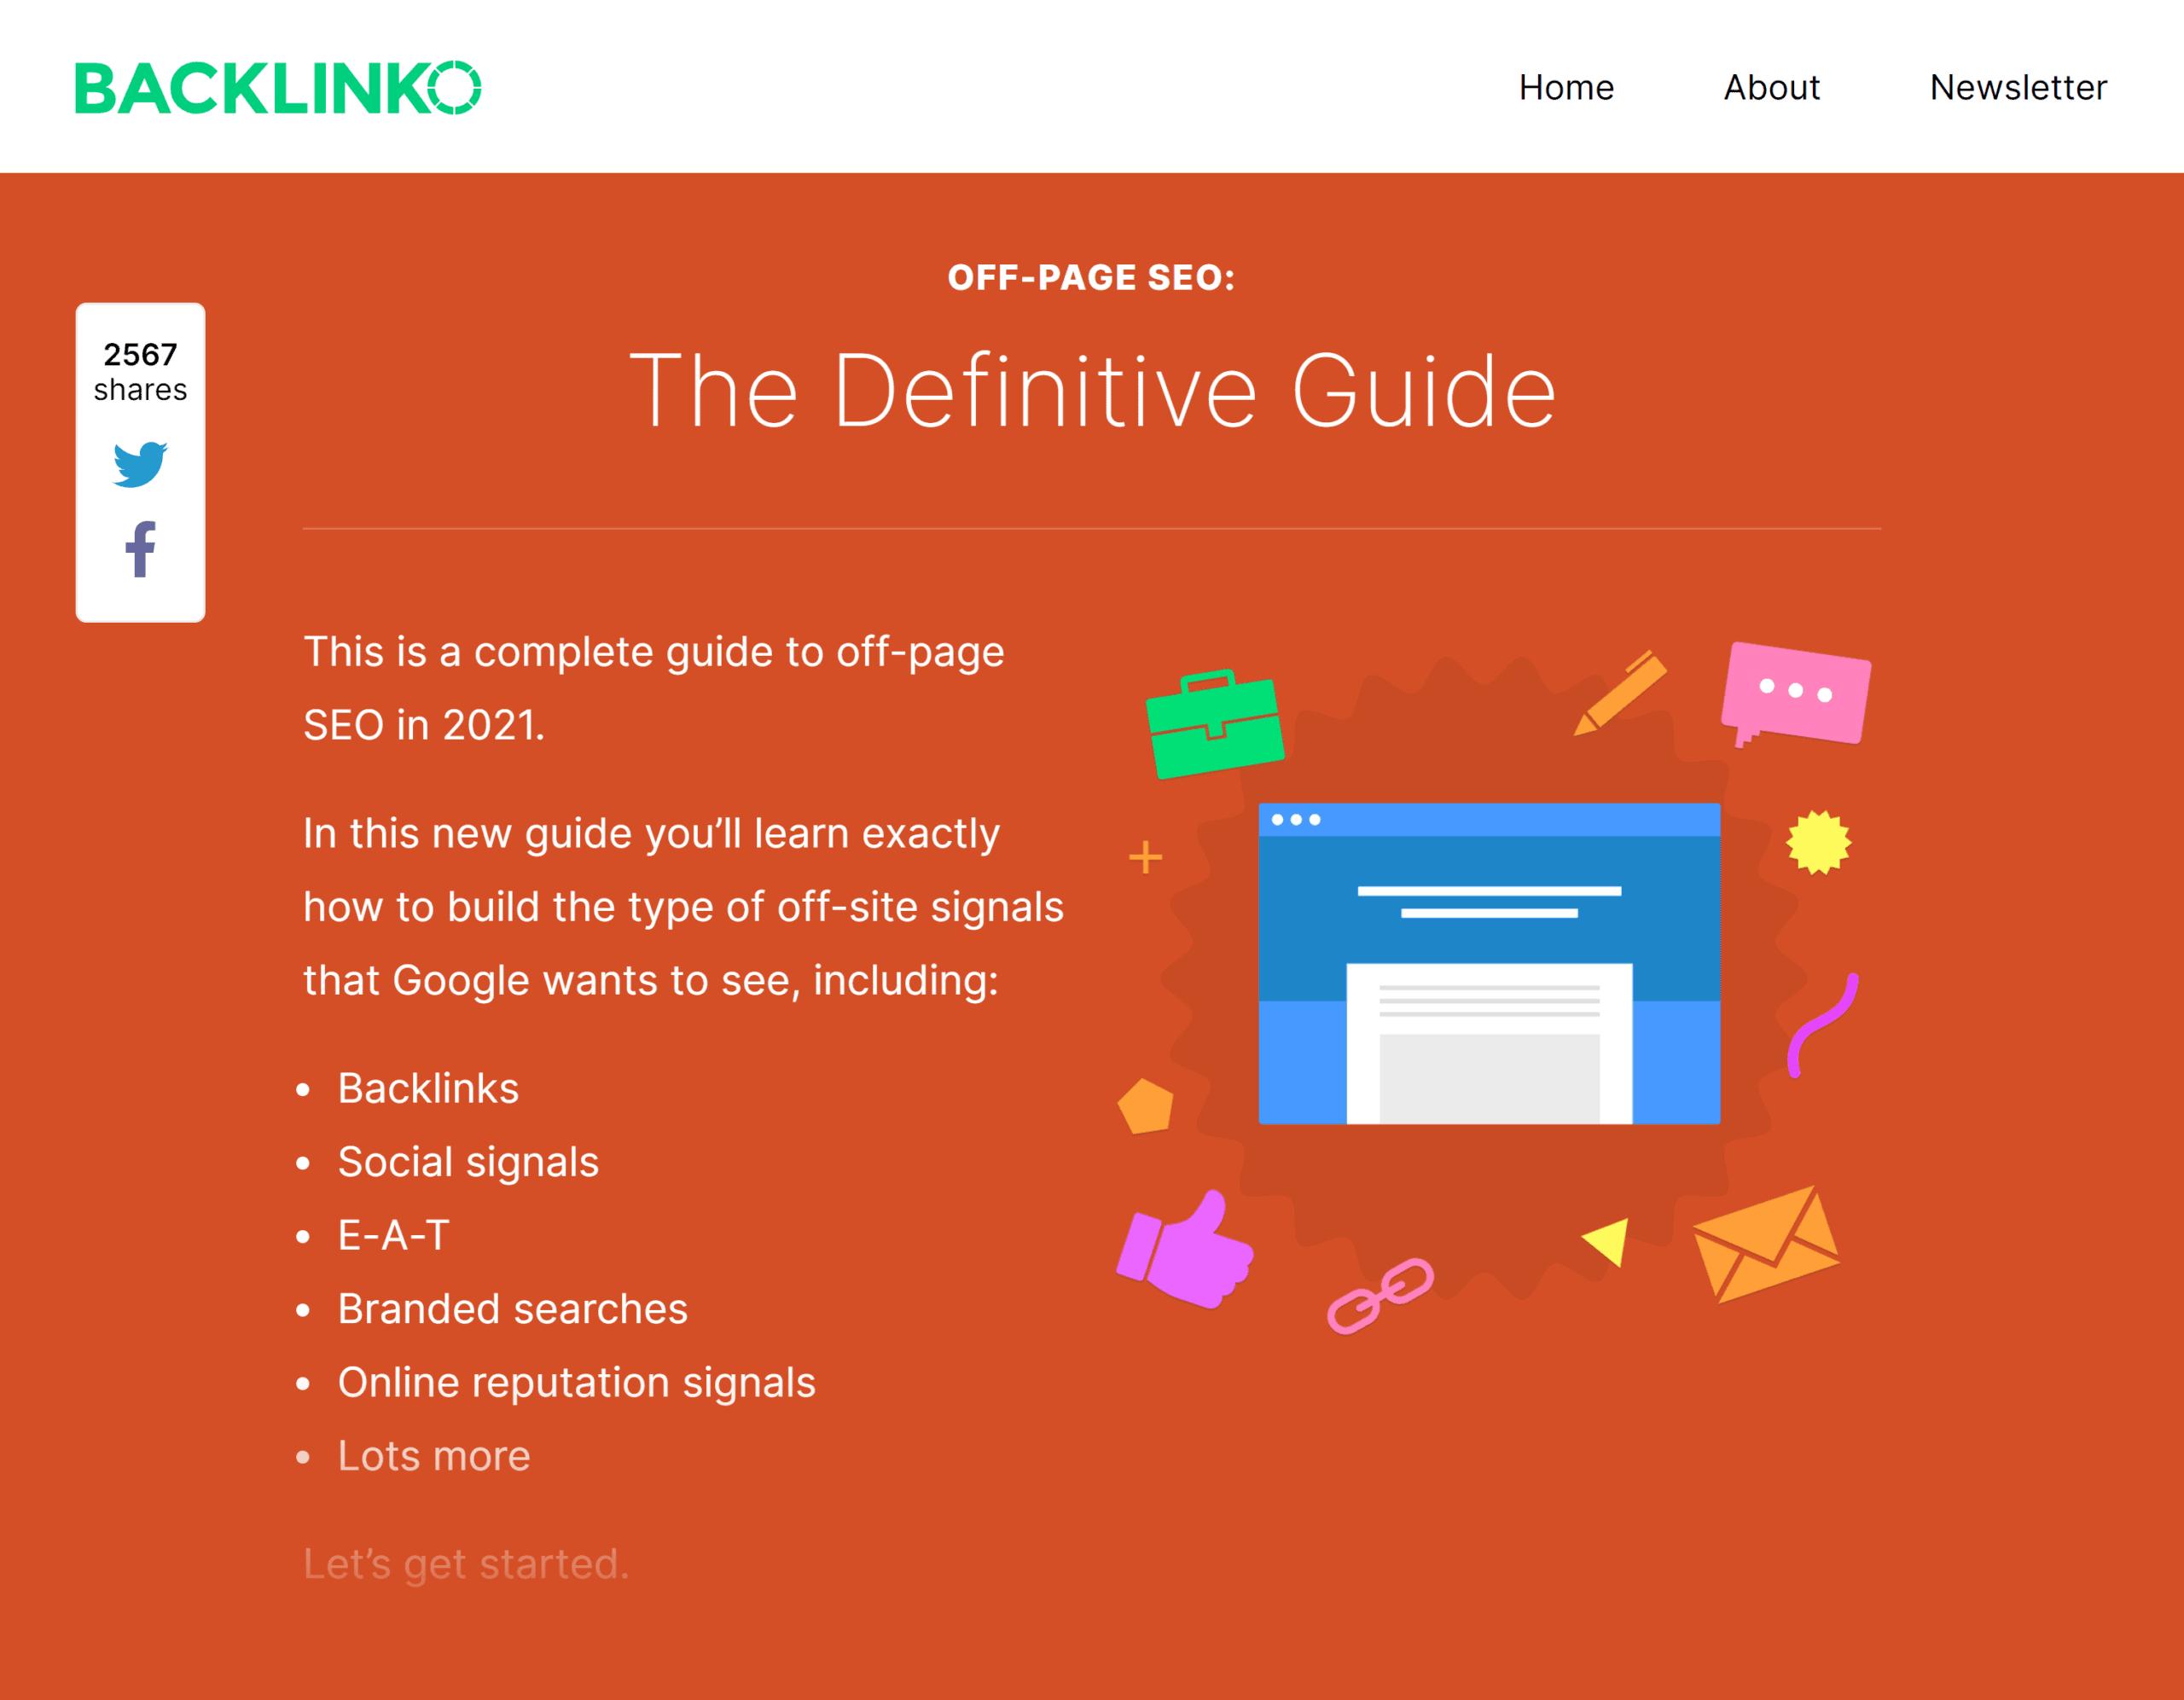 Backlinko – Off-page SEO guide